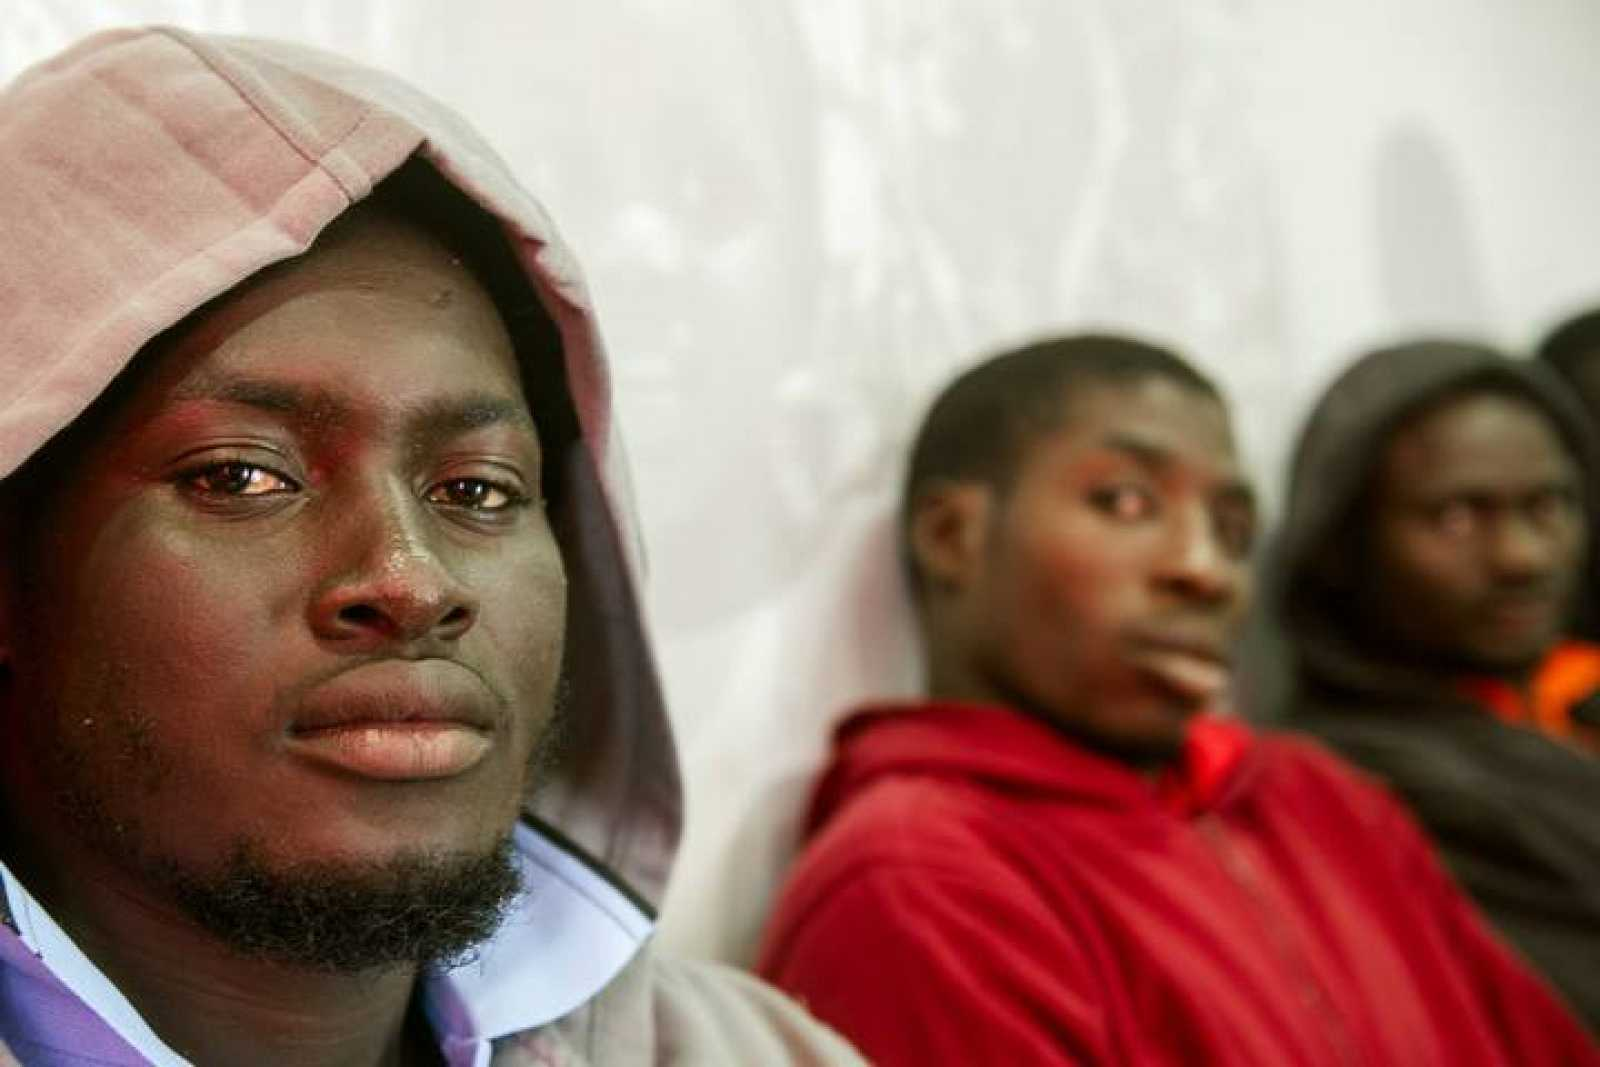 Inmigrantes en Tarifa, España